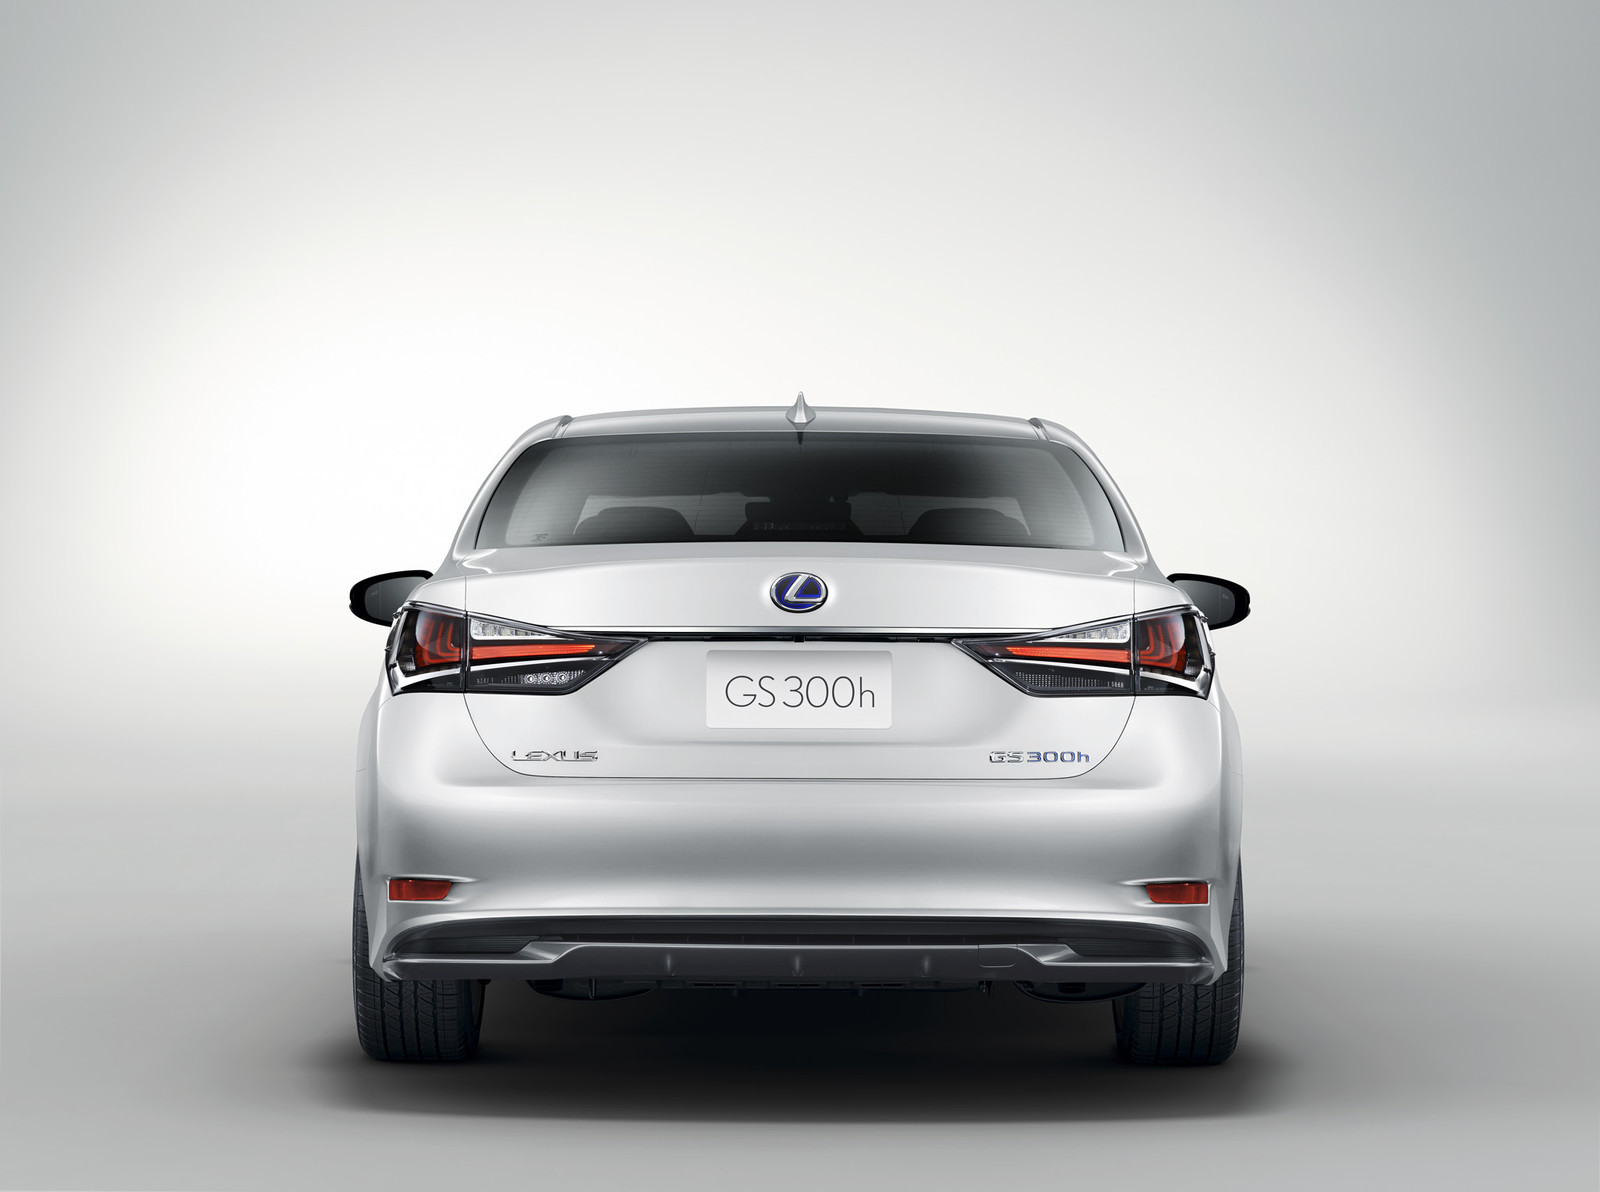 Lexus GS300h 2016